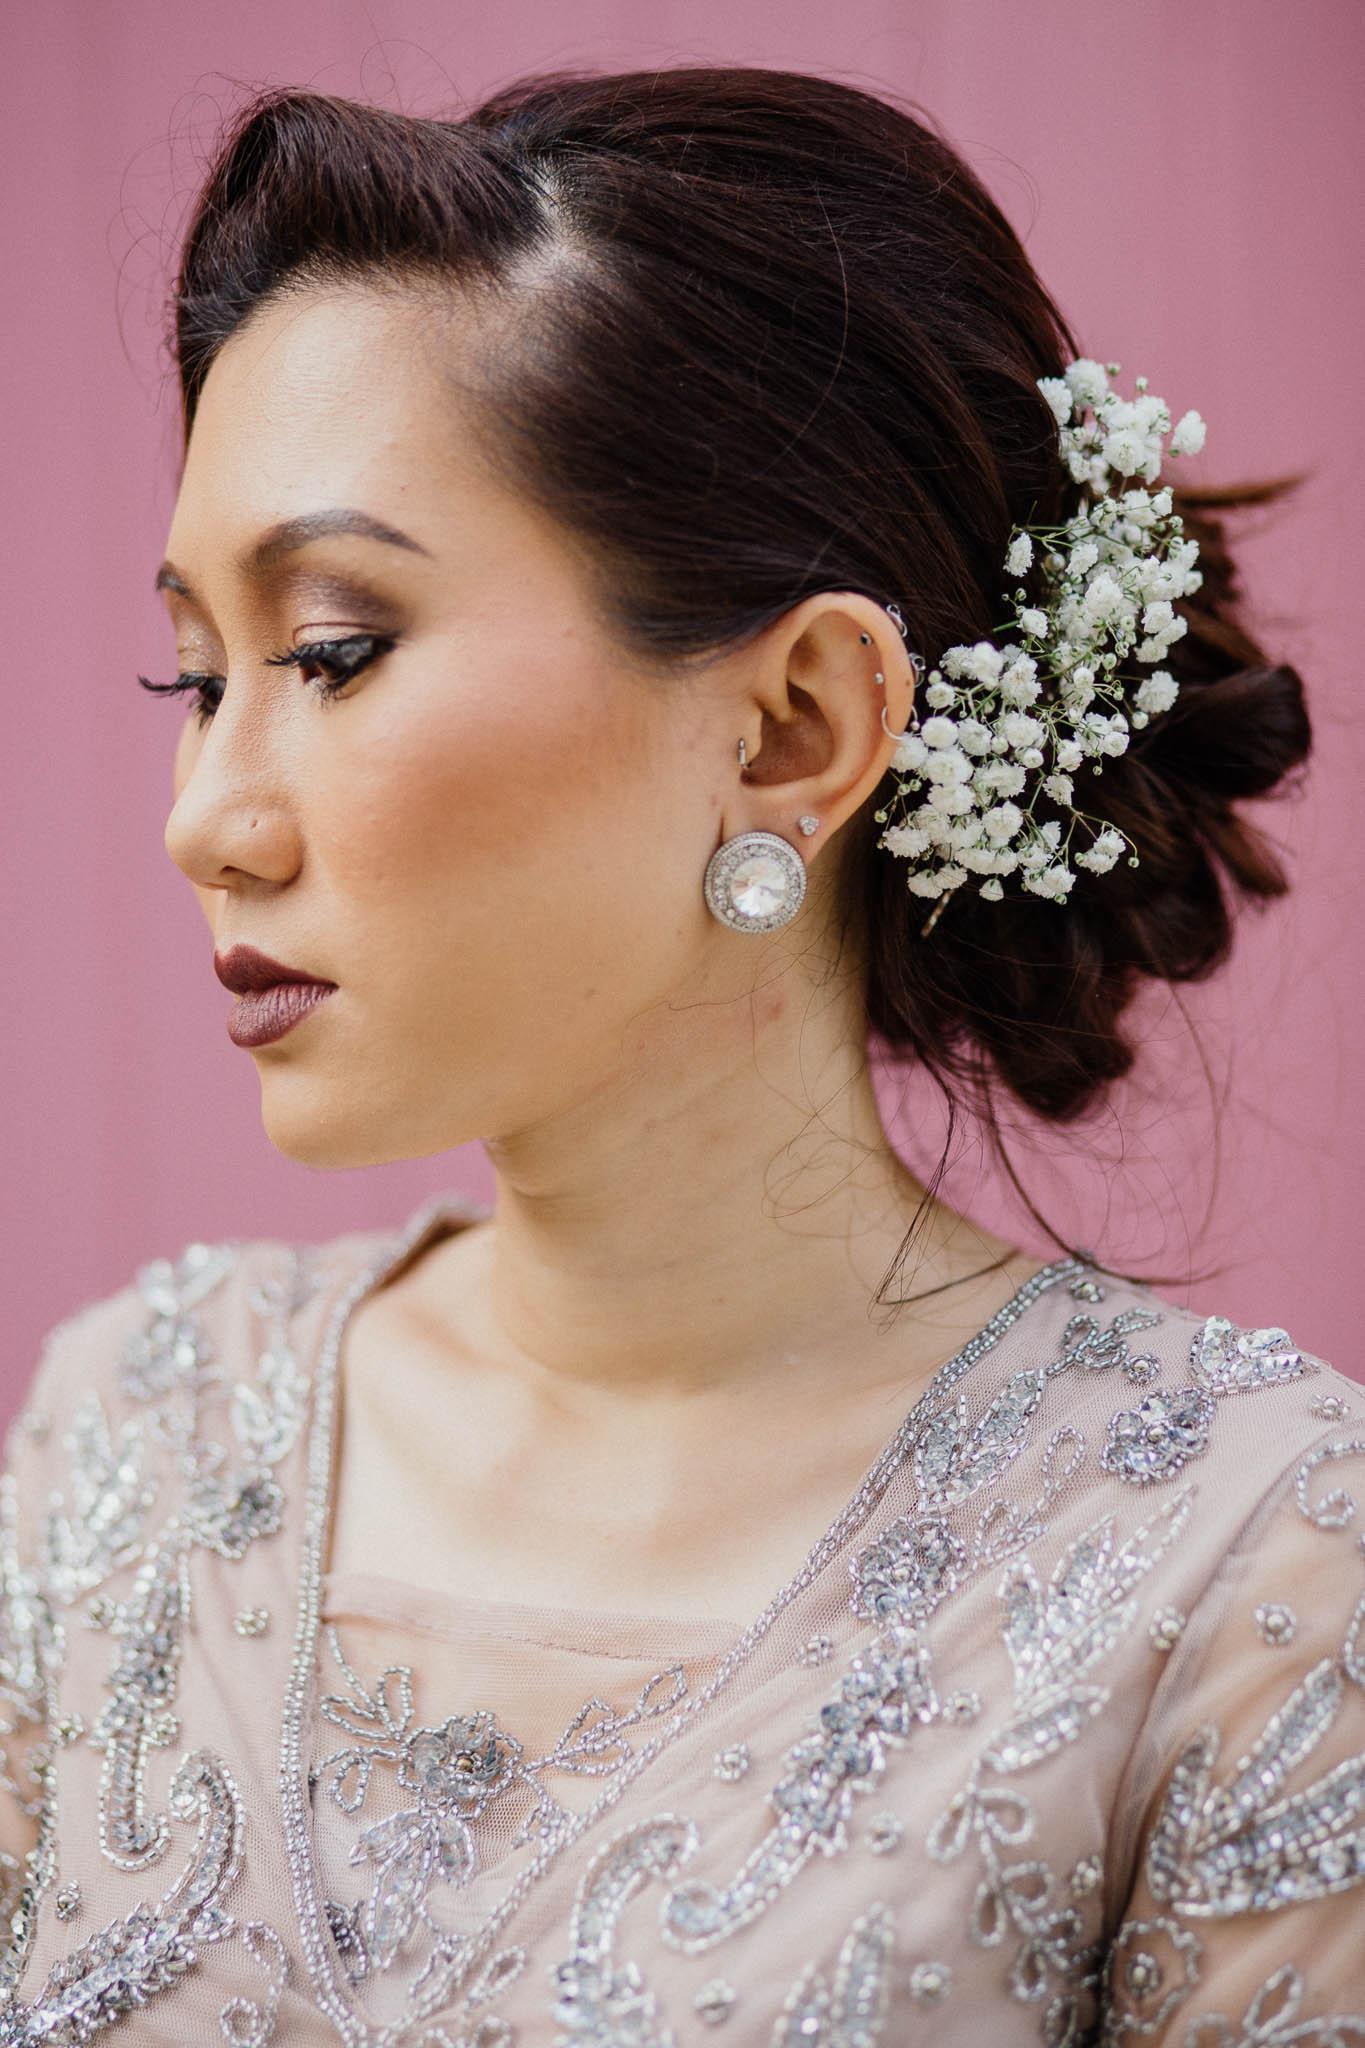 singapore-wedding-photographer-wedding-nufail-addafiq-075.jpg